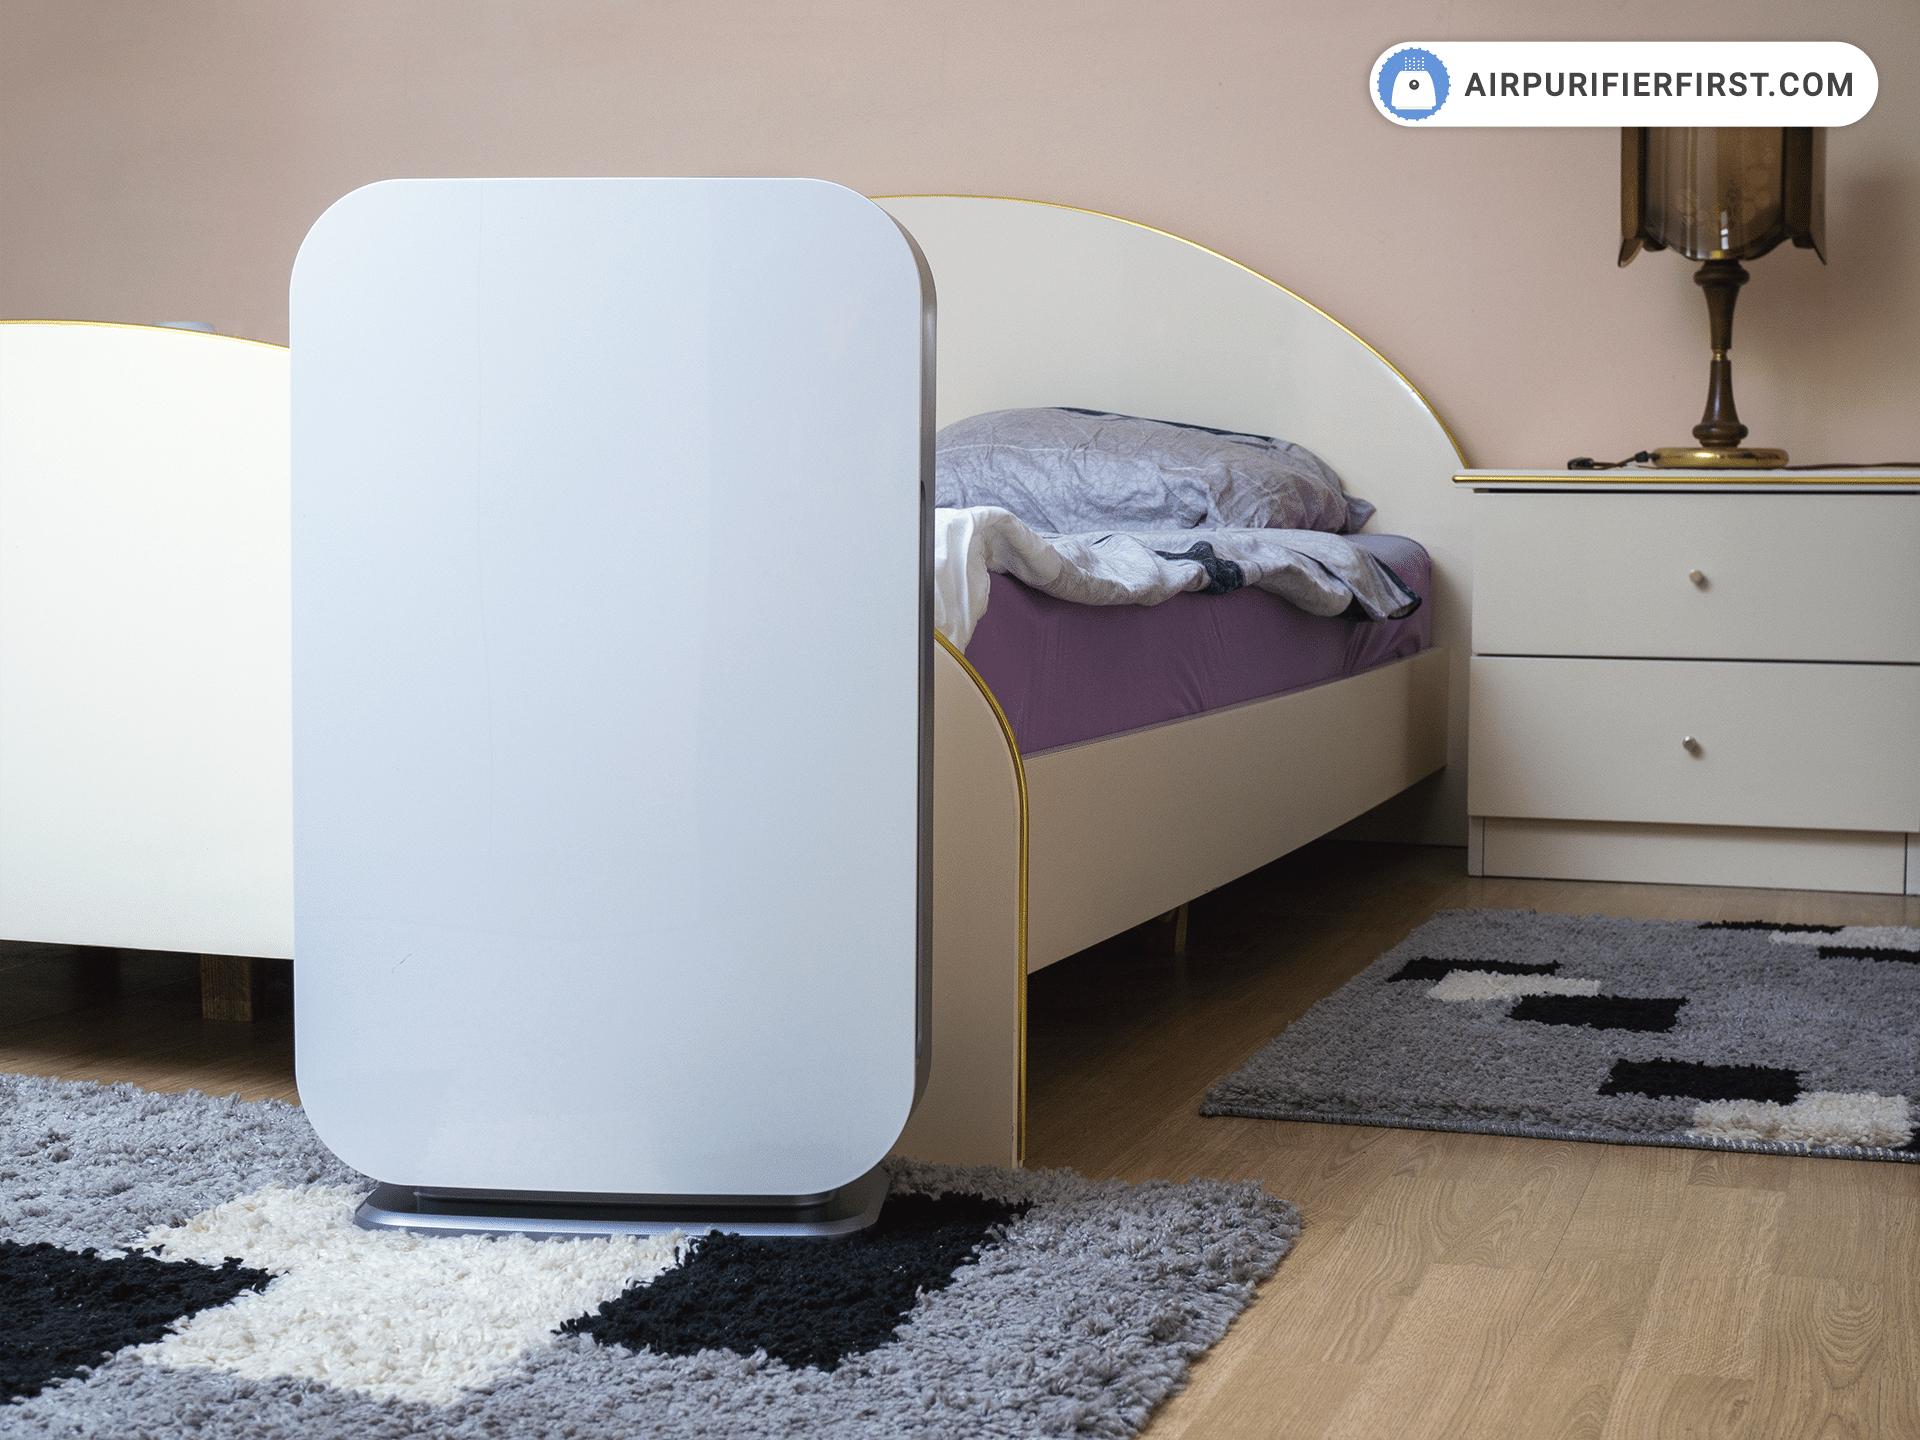 Best Air Purifier For Bedroom - Alen BreatheSmart FLEX